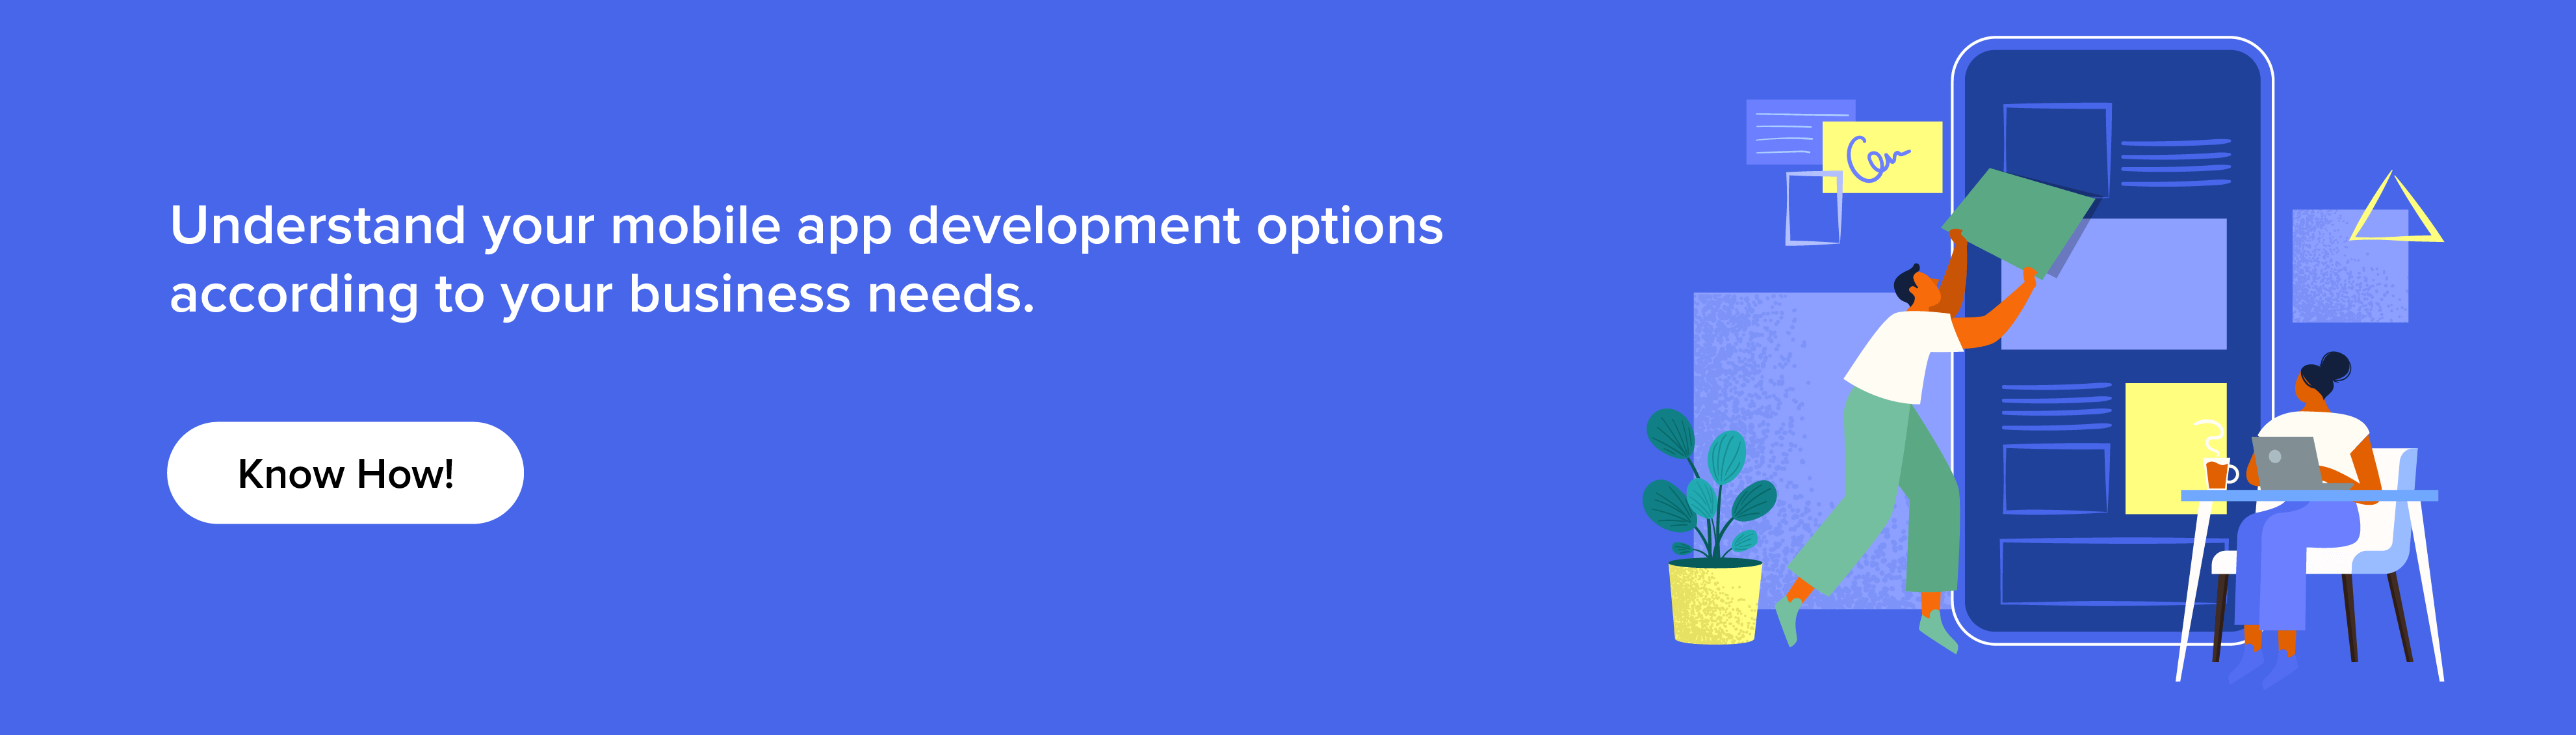 understand your mobile app development option